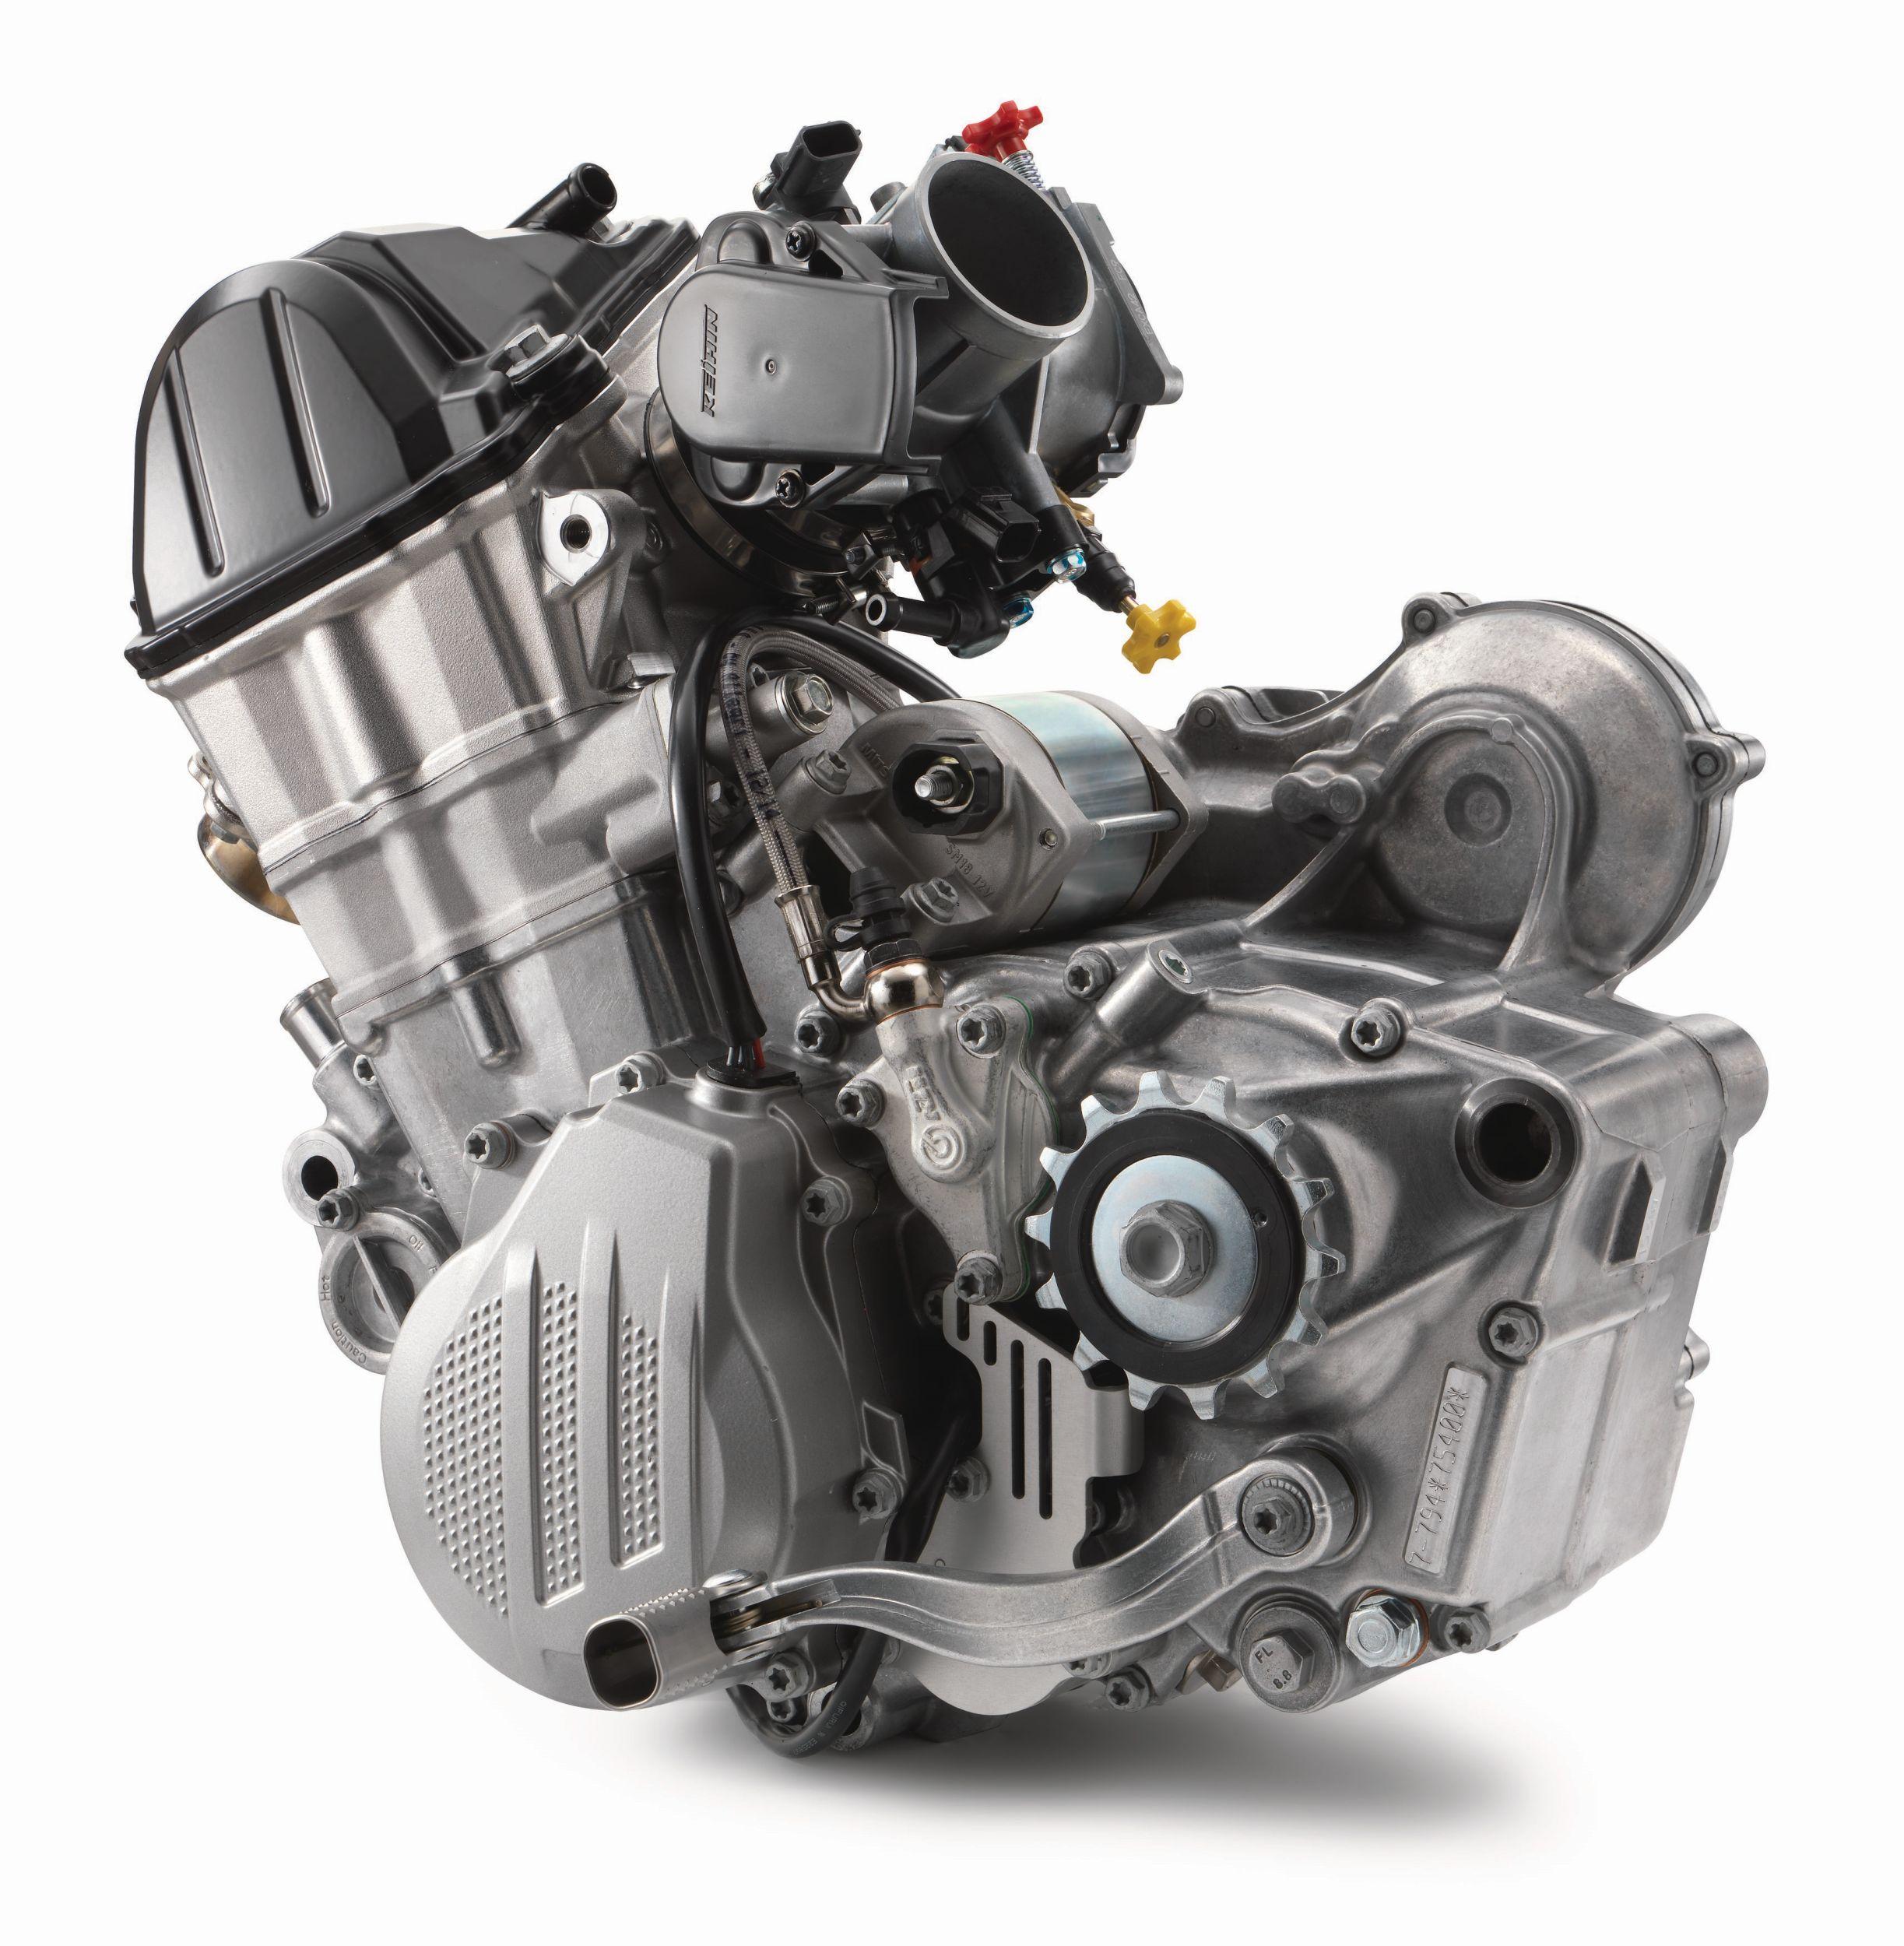 Ktm  Sx Engine For Sale